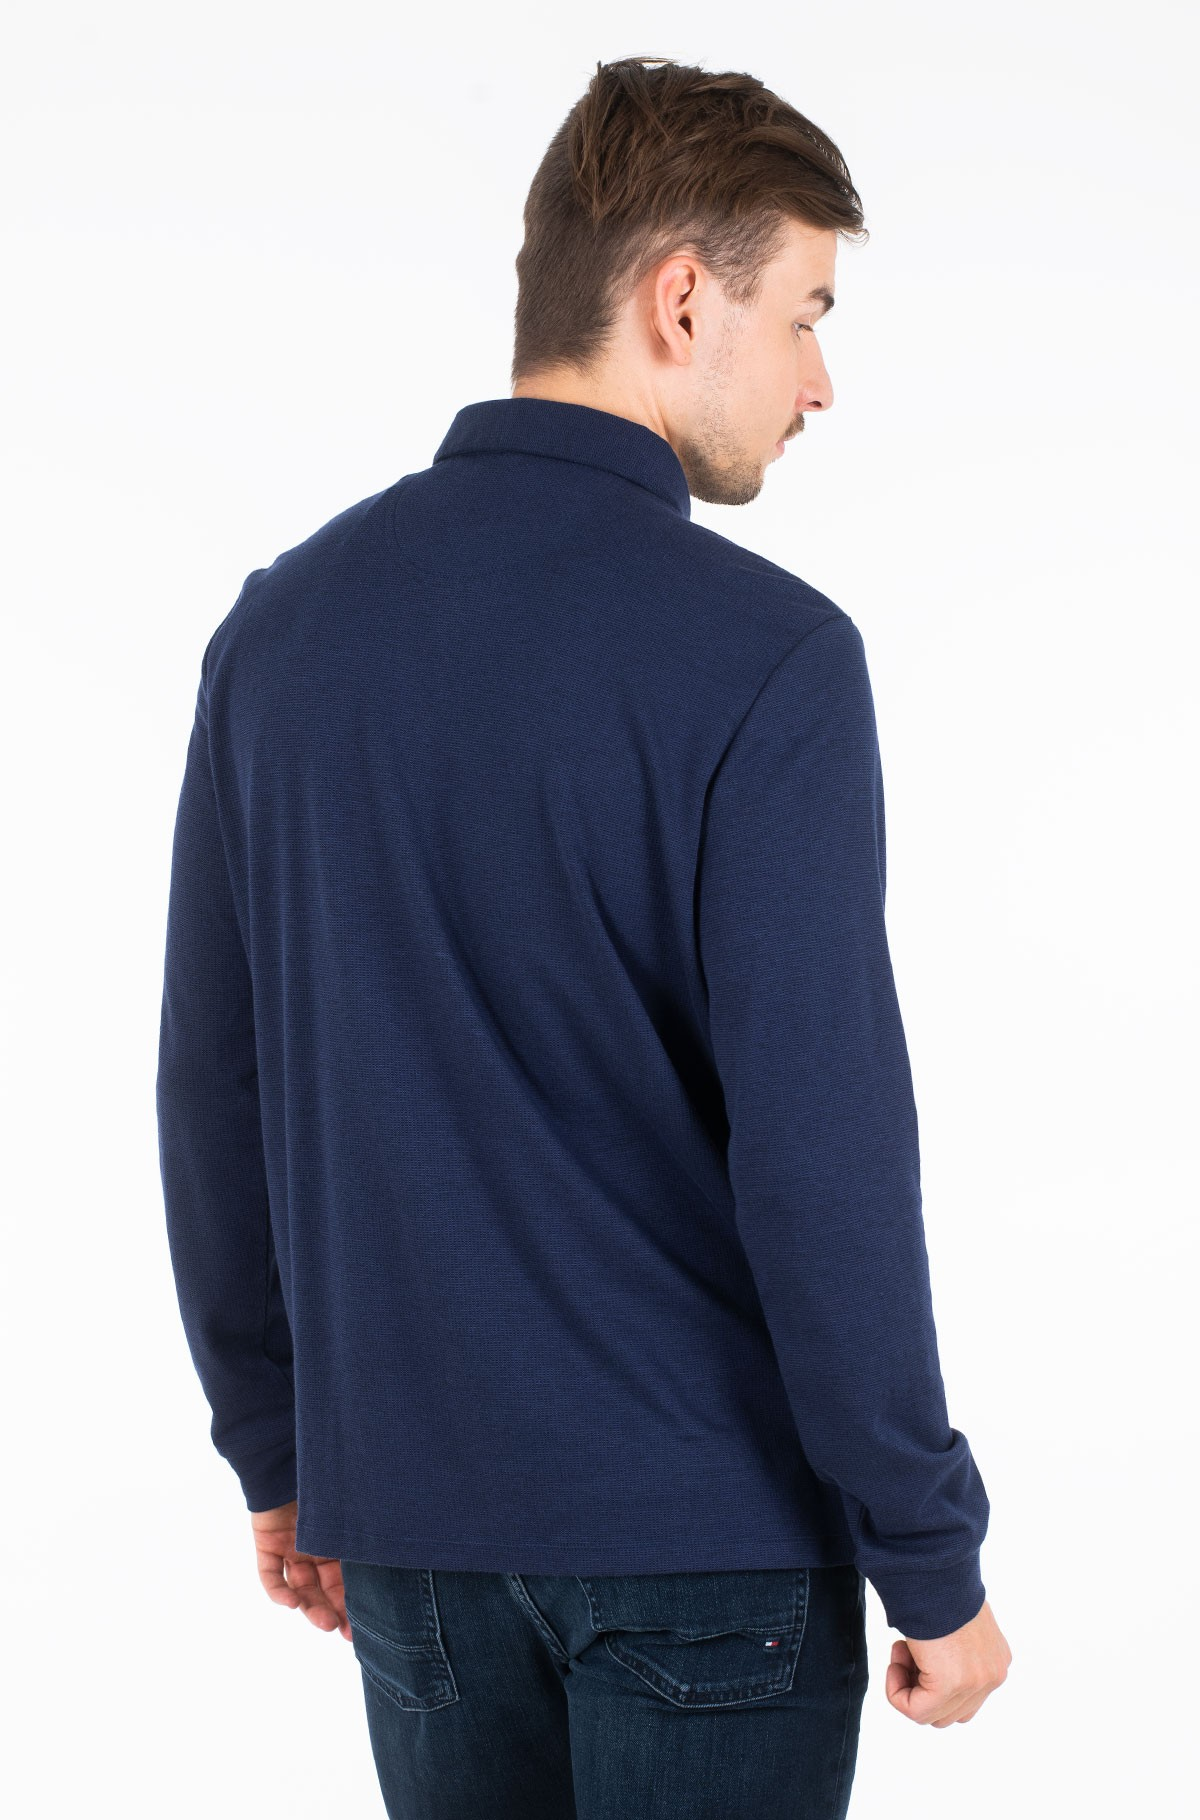 Polo marškinėliai ilgomis rankovėmis 53714-92318-full-2